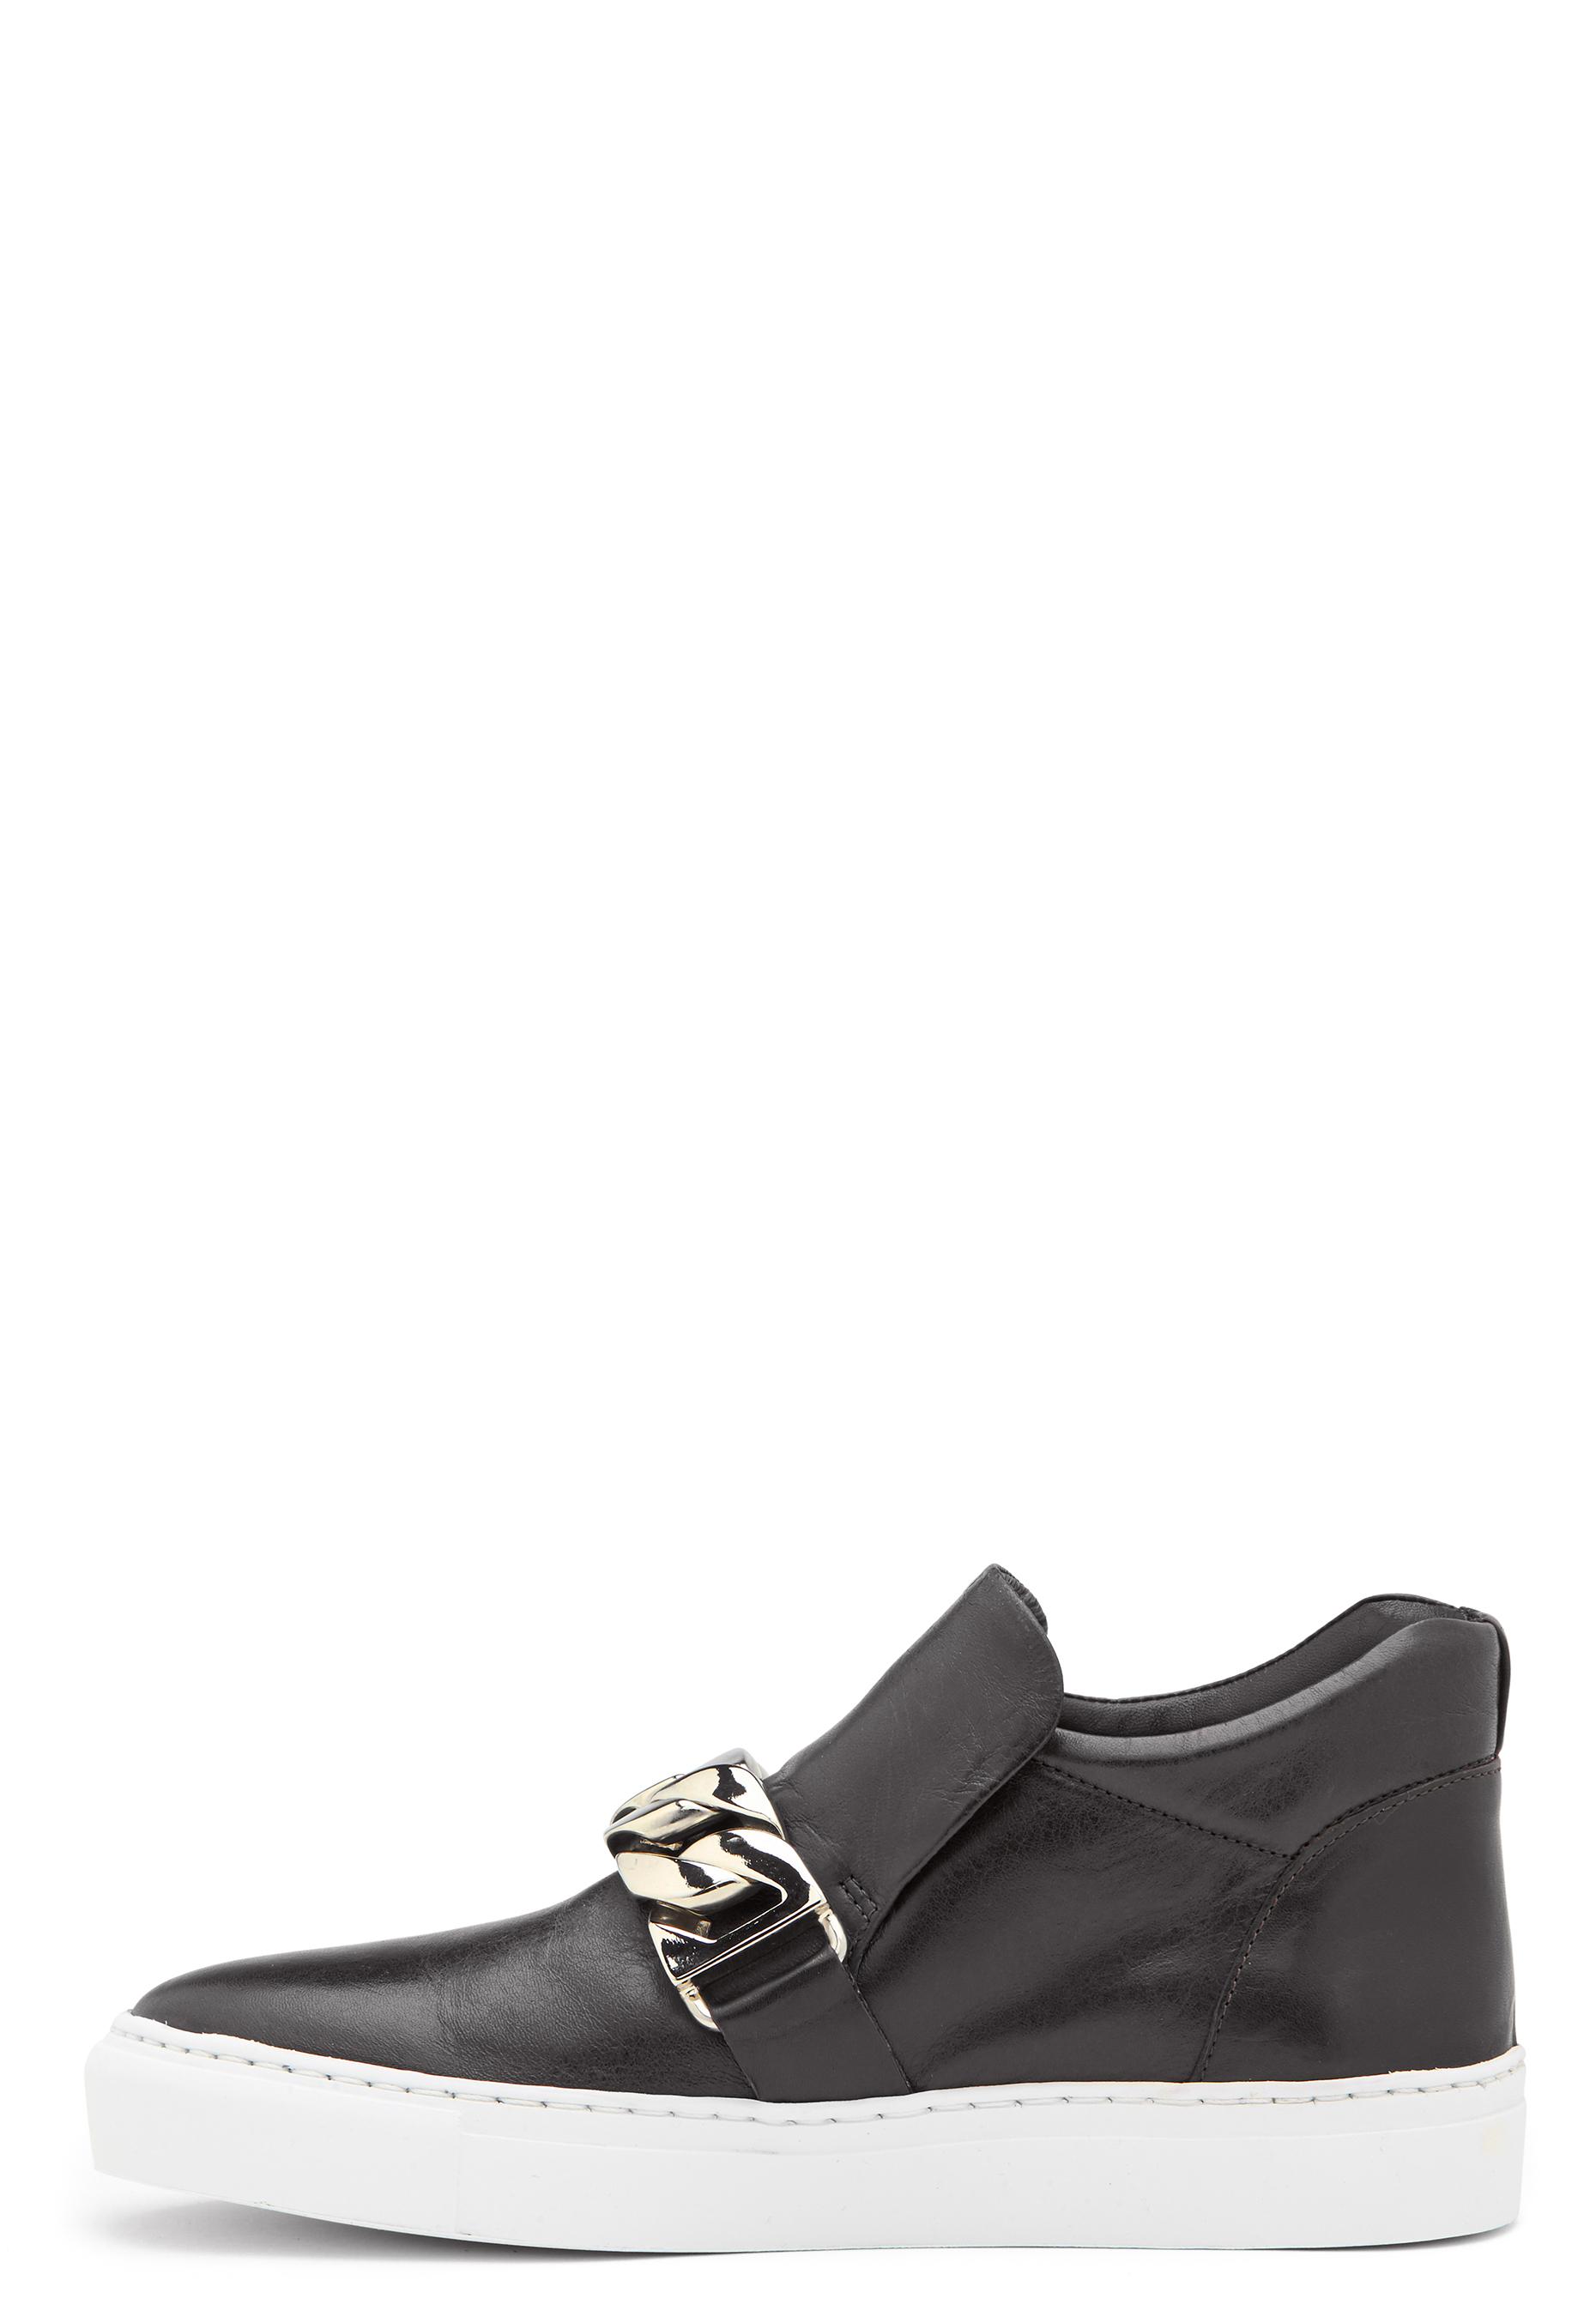 50fef2290a4 Billi Bi Leather Sneakers Black/ Gold - Bubbleroom